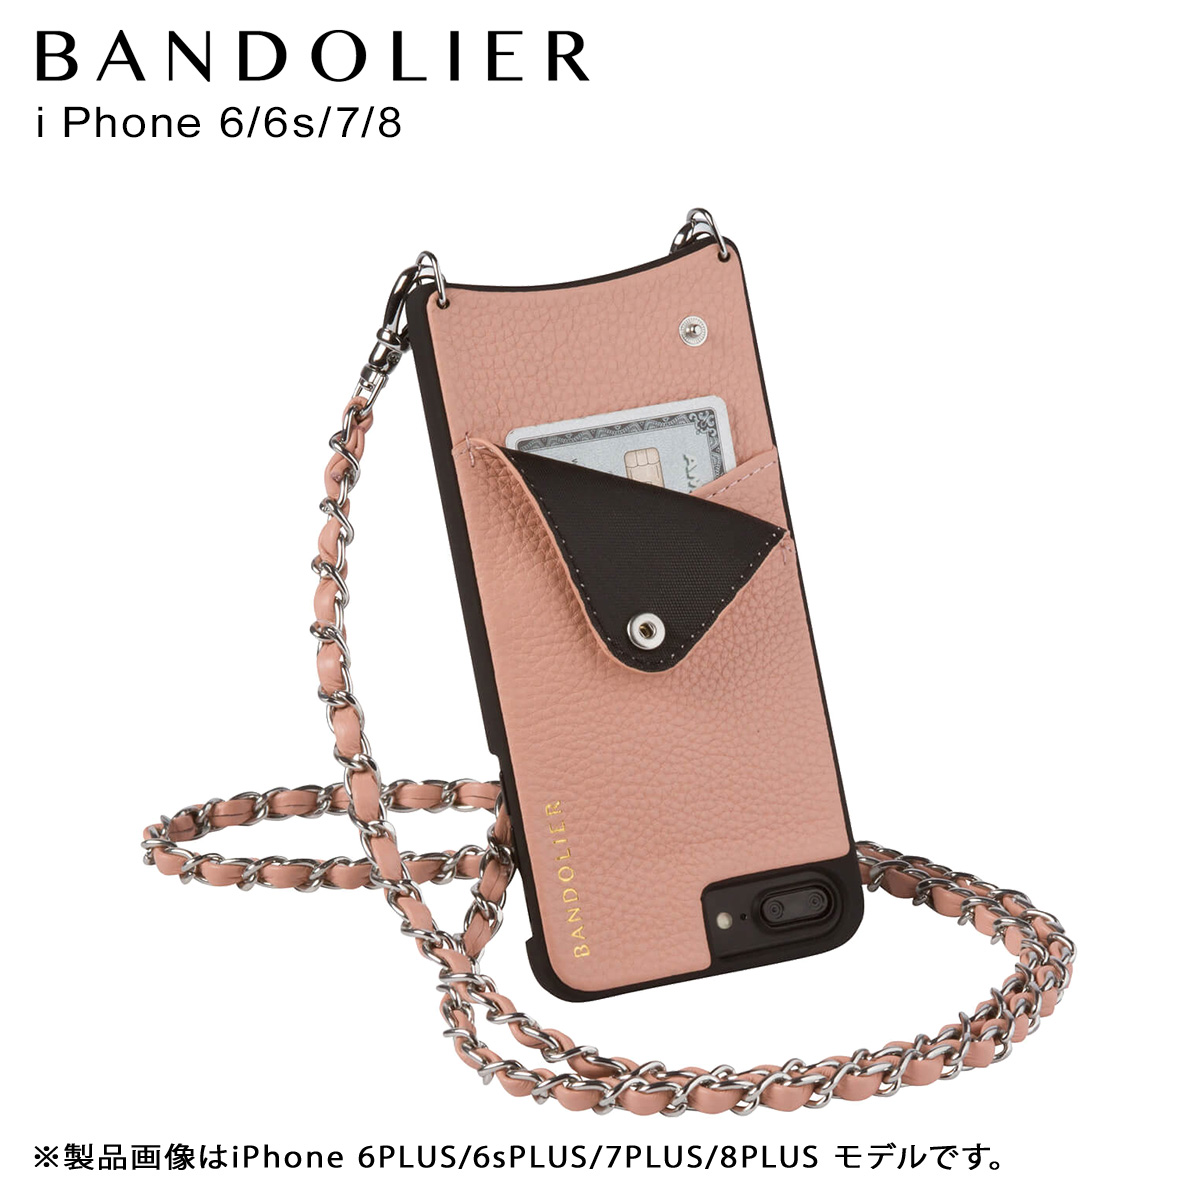 BANDOLIER iPhone8 iPhone7 6s LUCY BLUSH バンドリヤー ケース スマホ アイフォン メンズ レディース